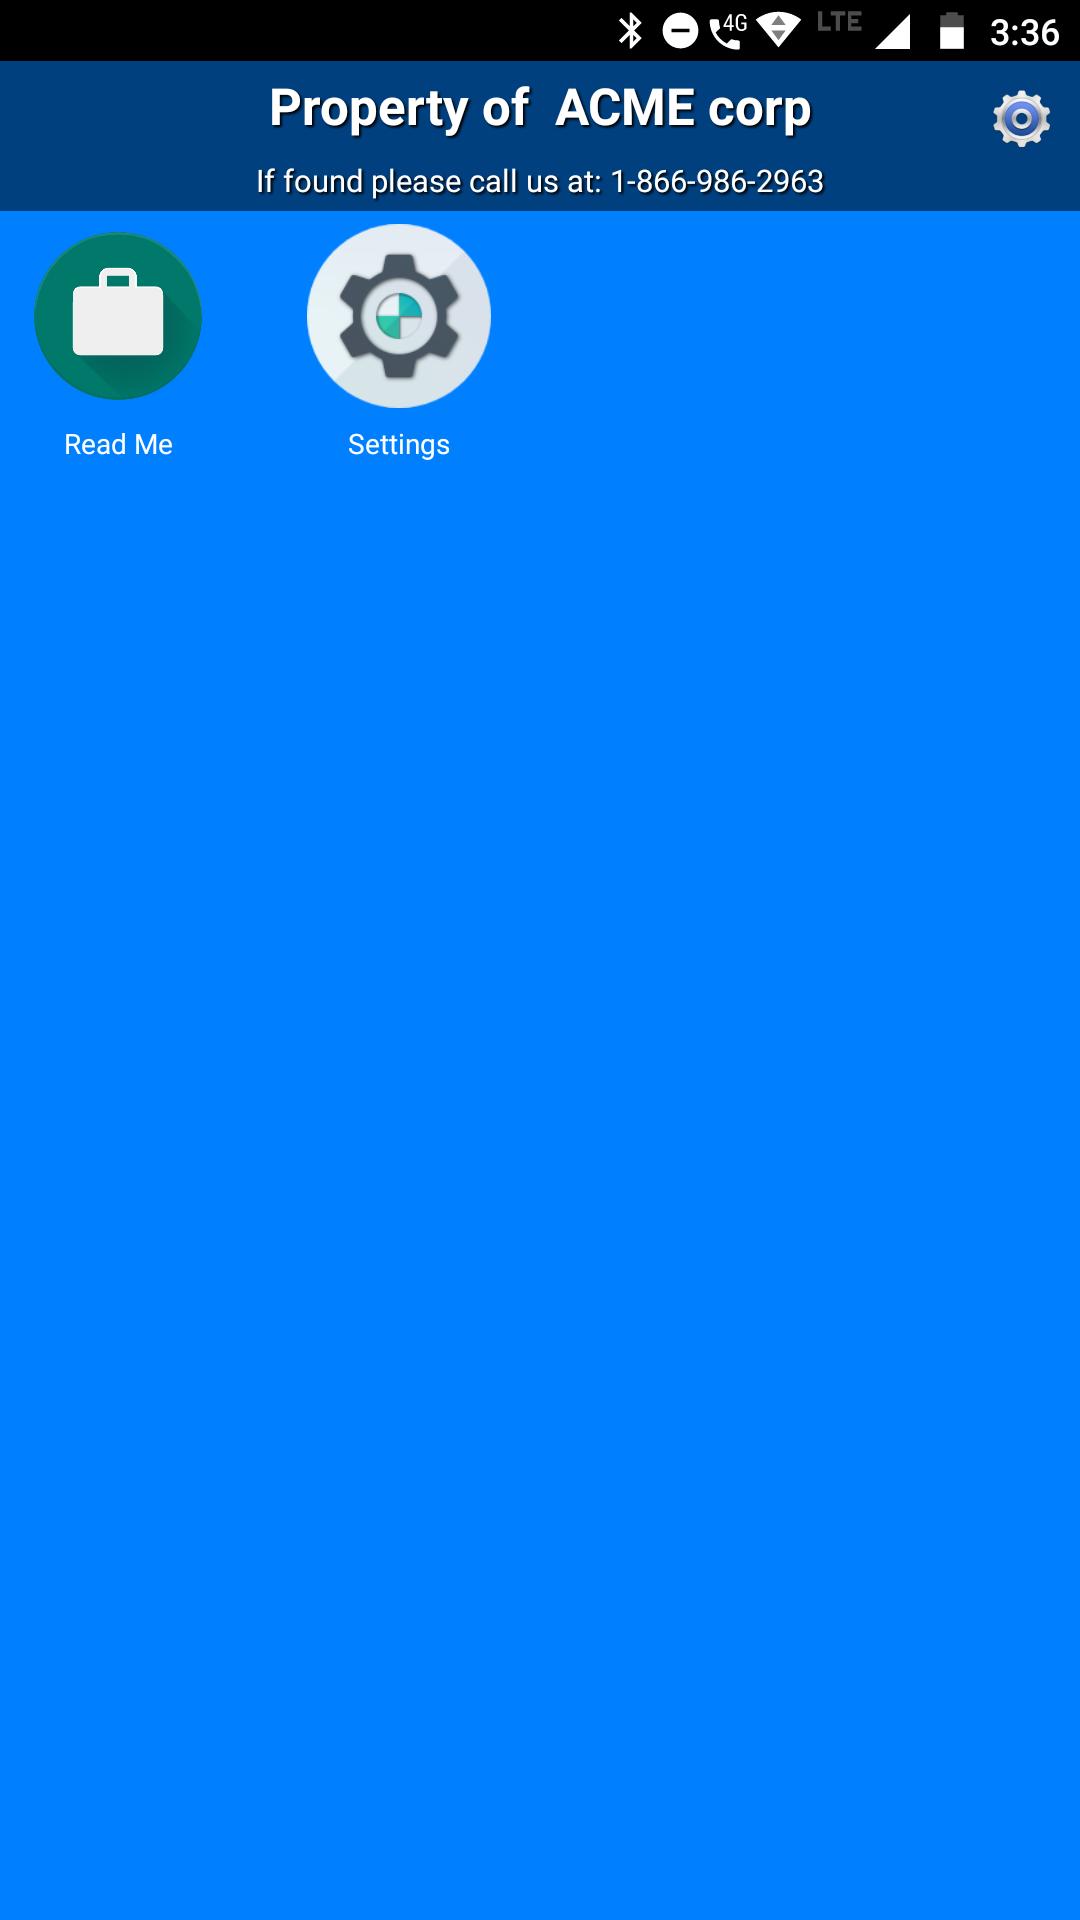 Web App in Kiosk mode